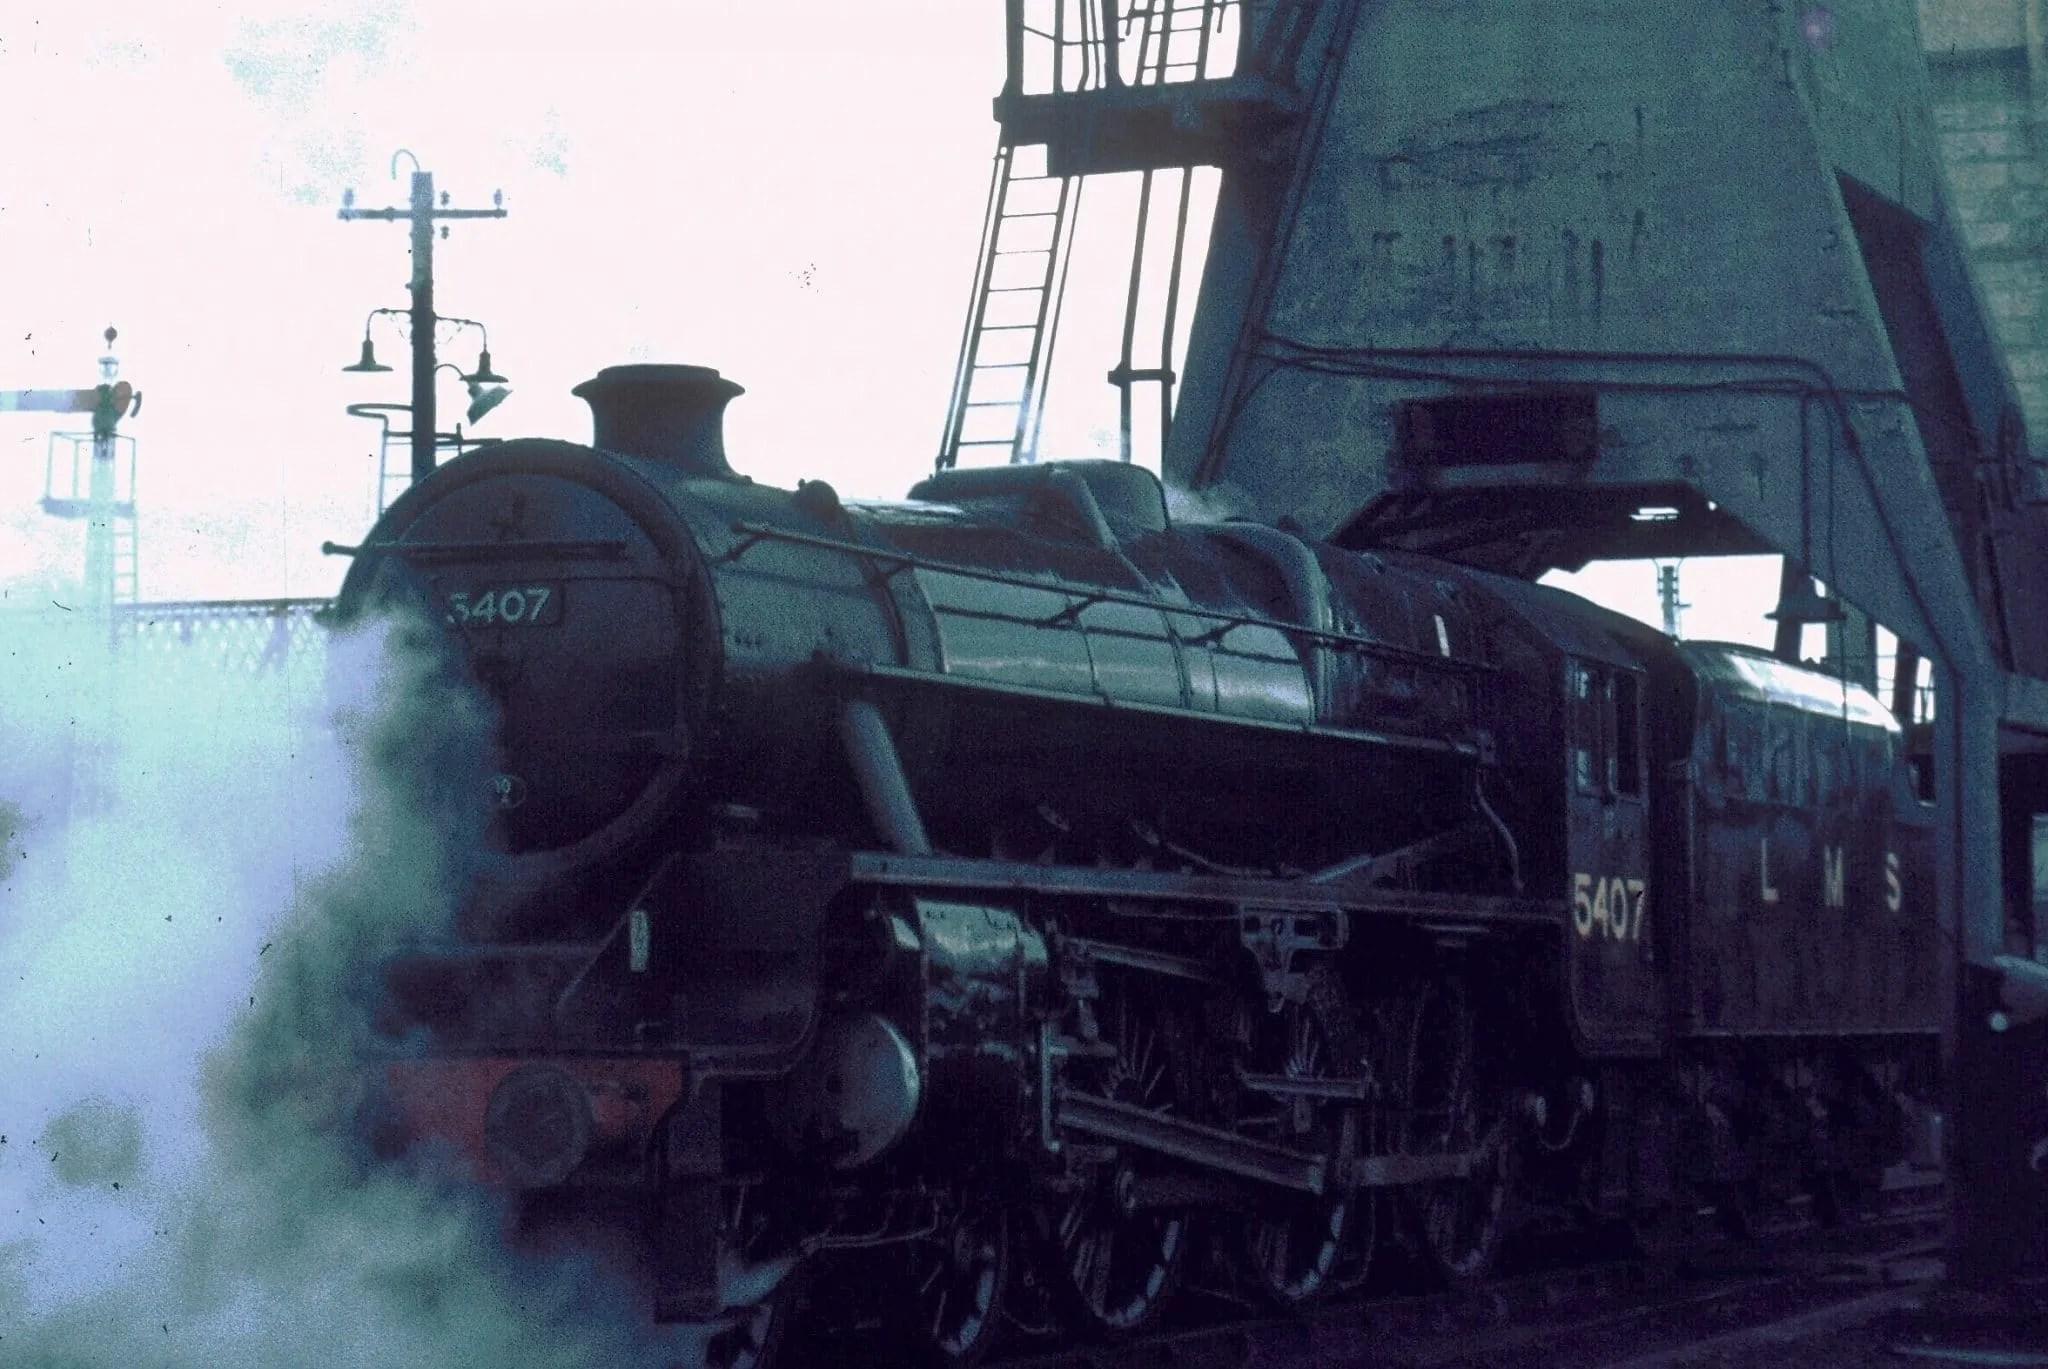 Stanier Black Five 5407 at Carnforth - steam locomotive